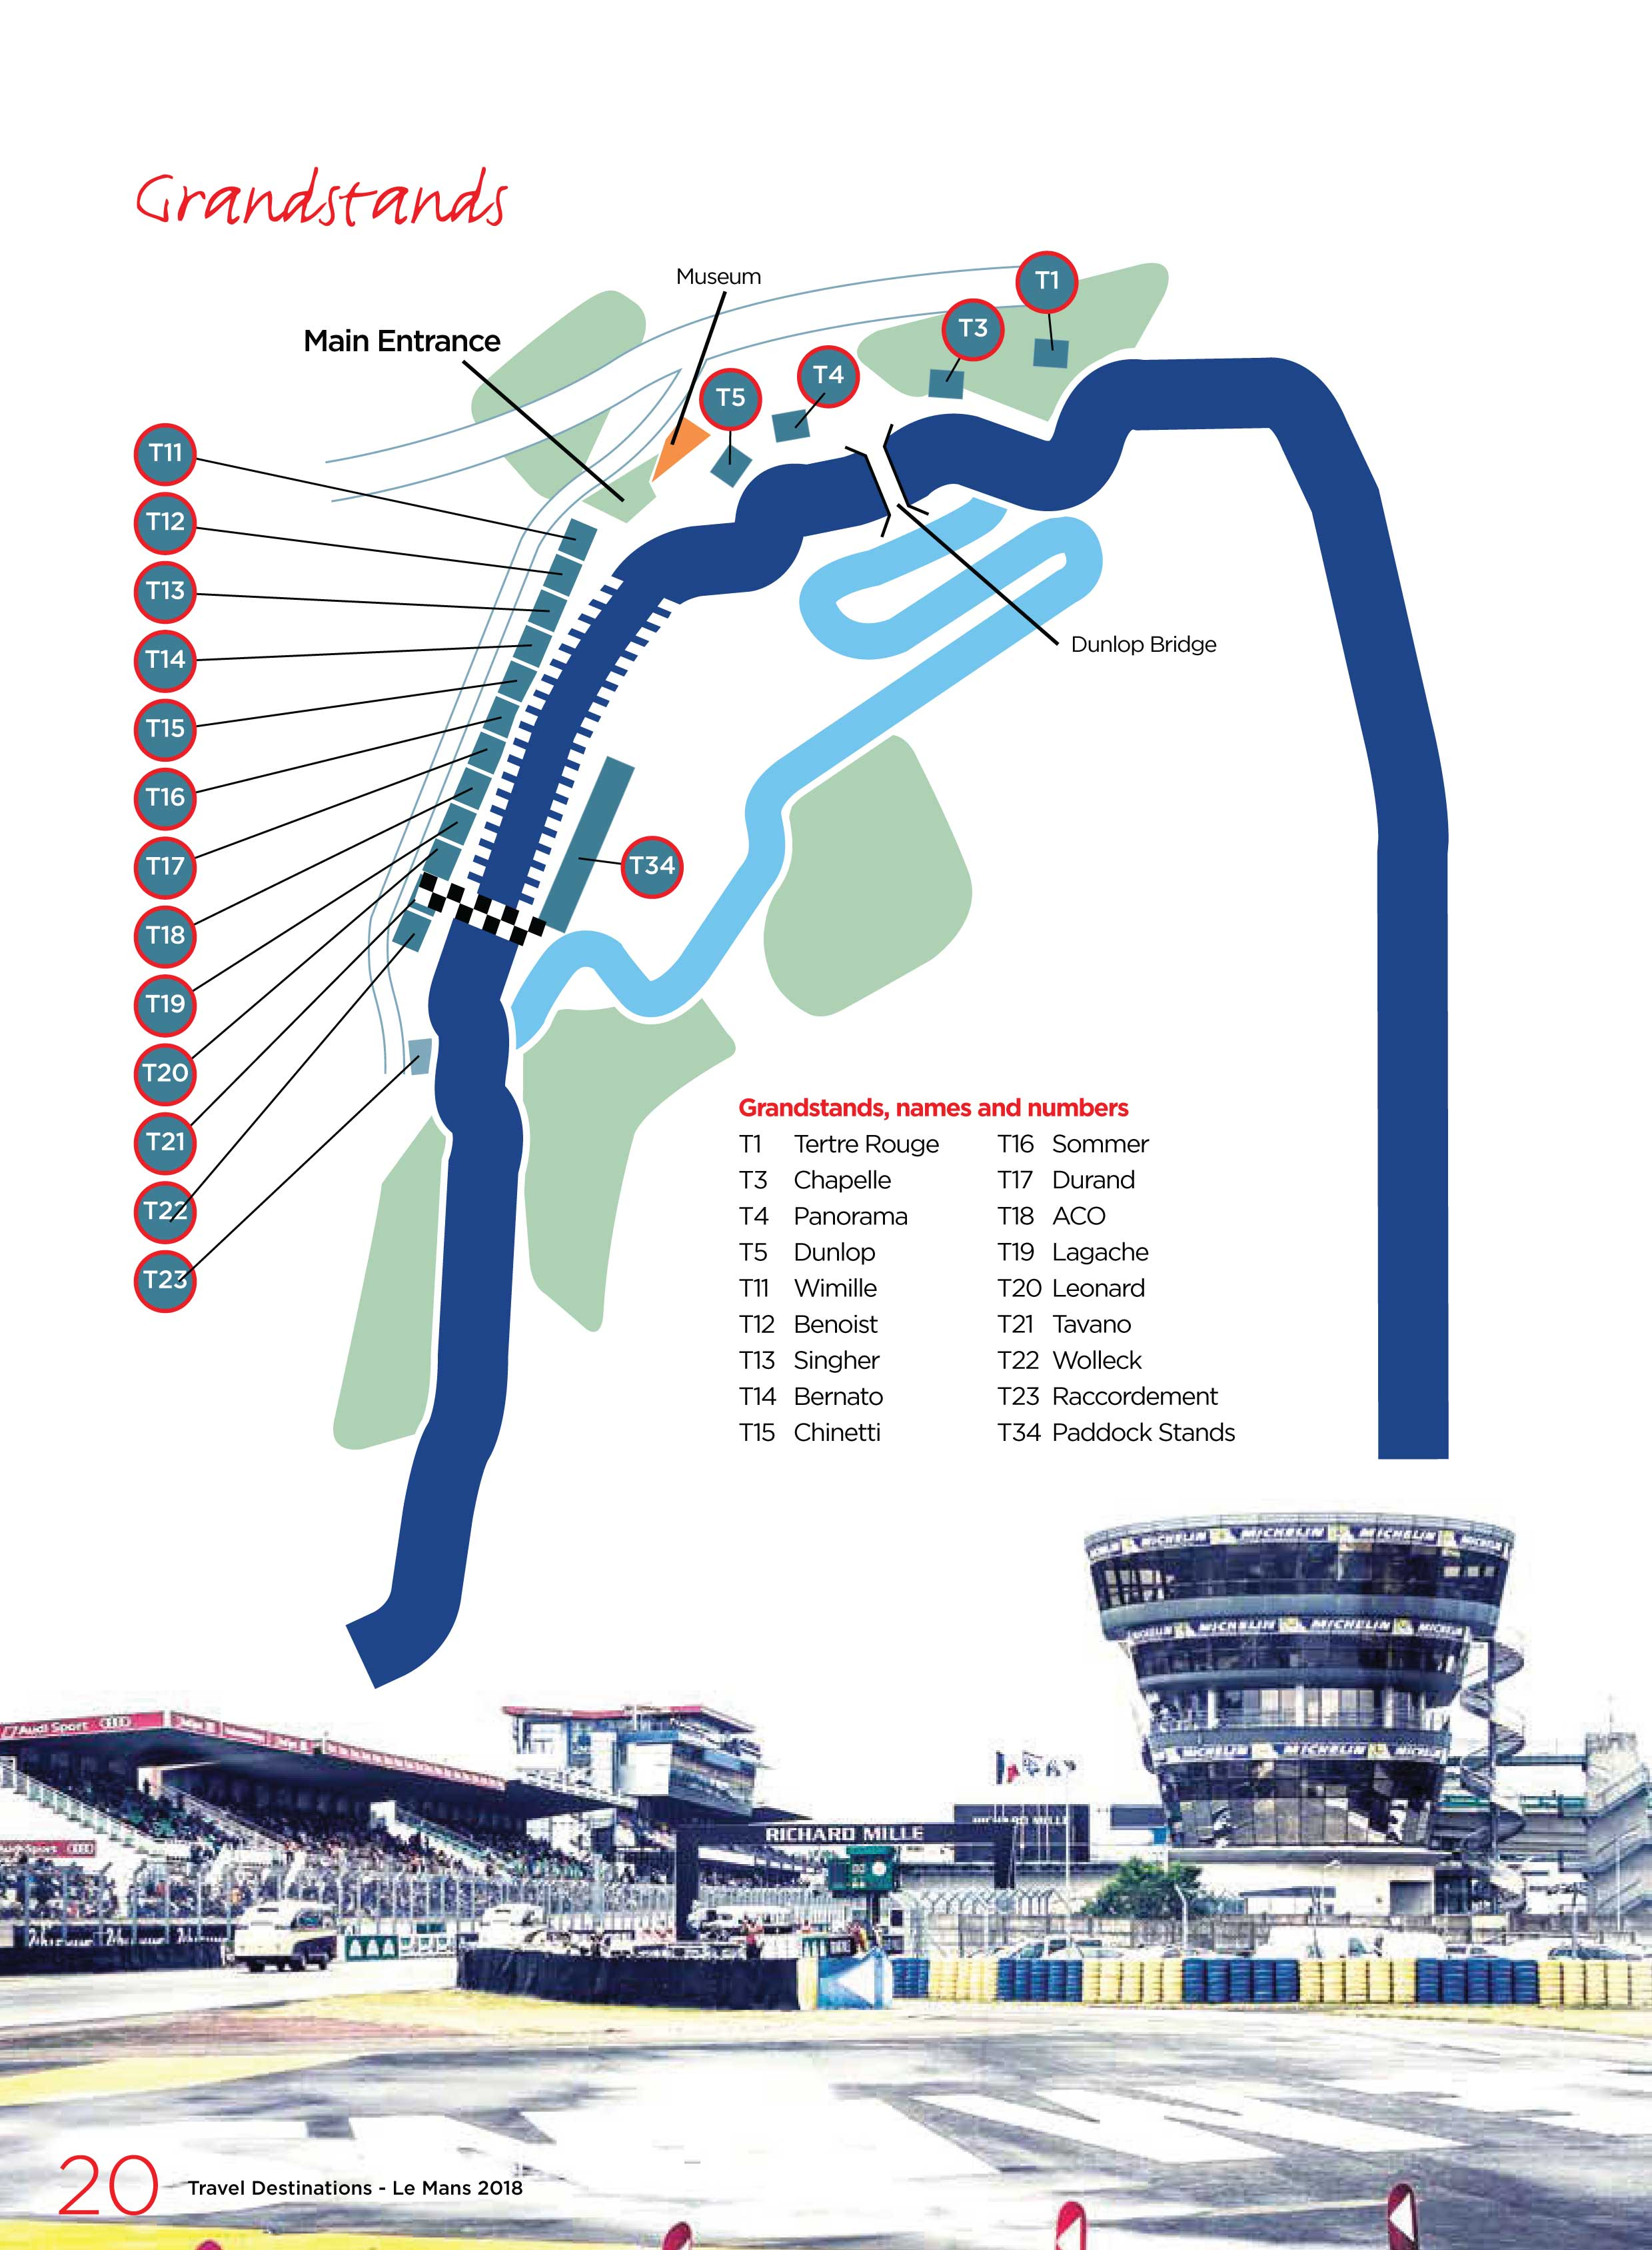 Le Mans Grandstands